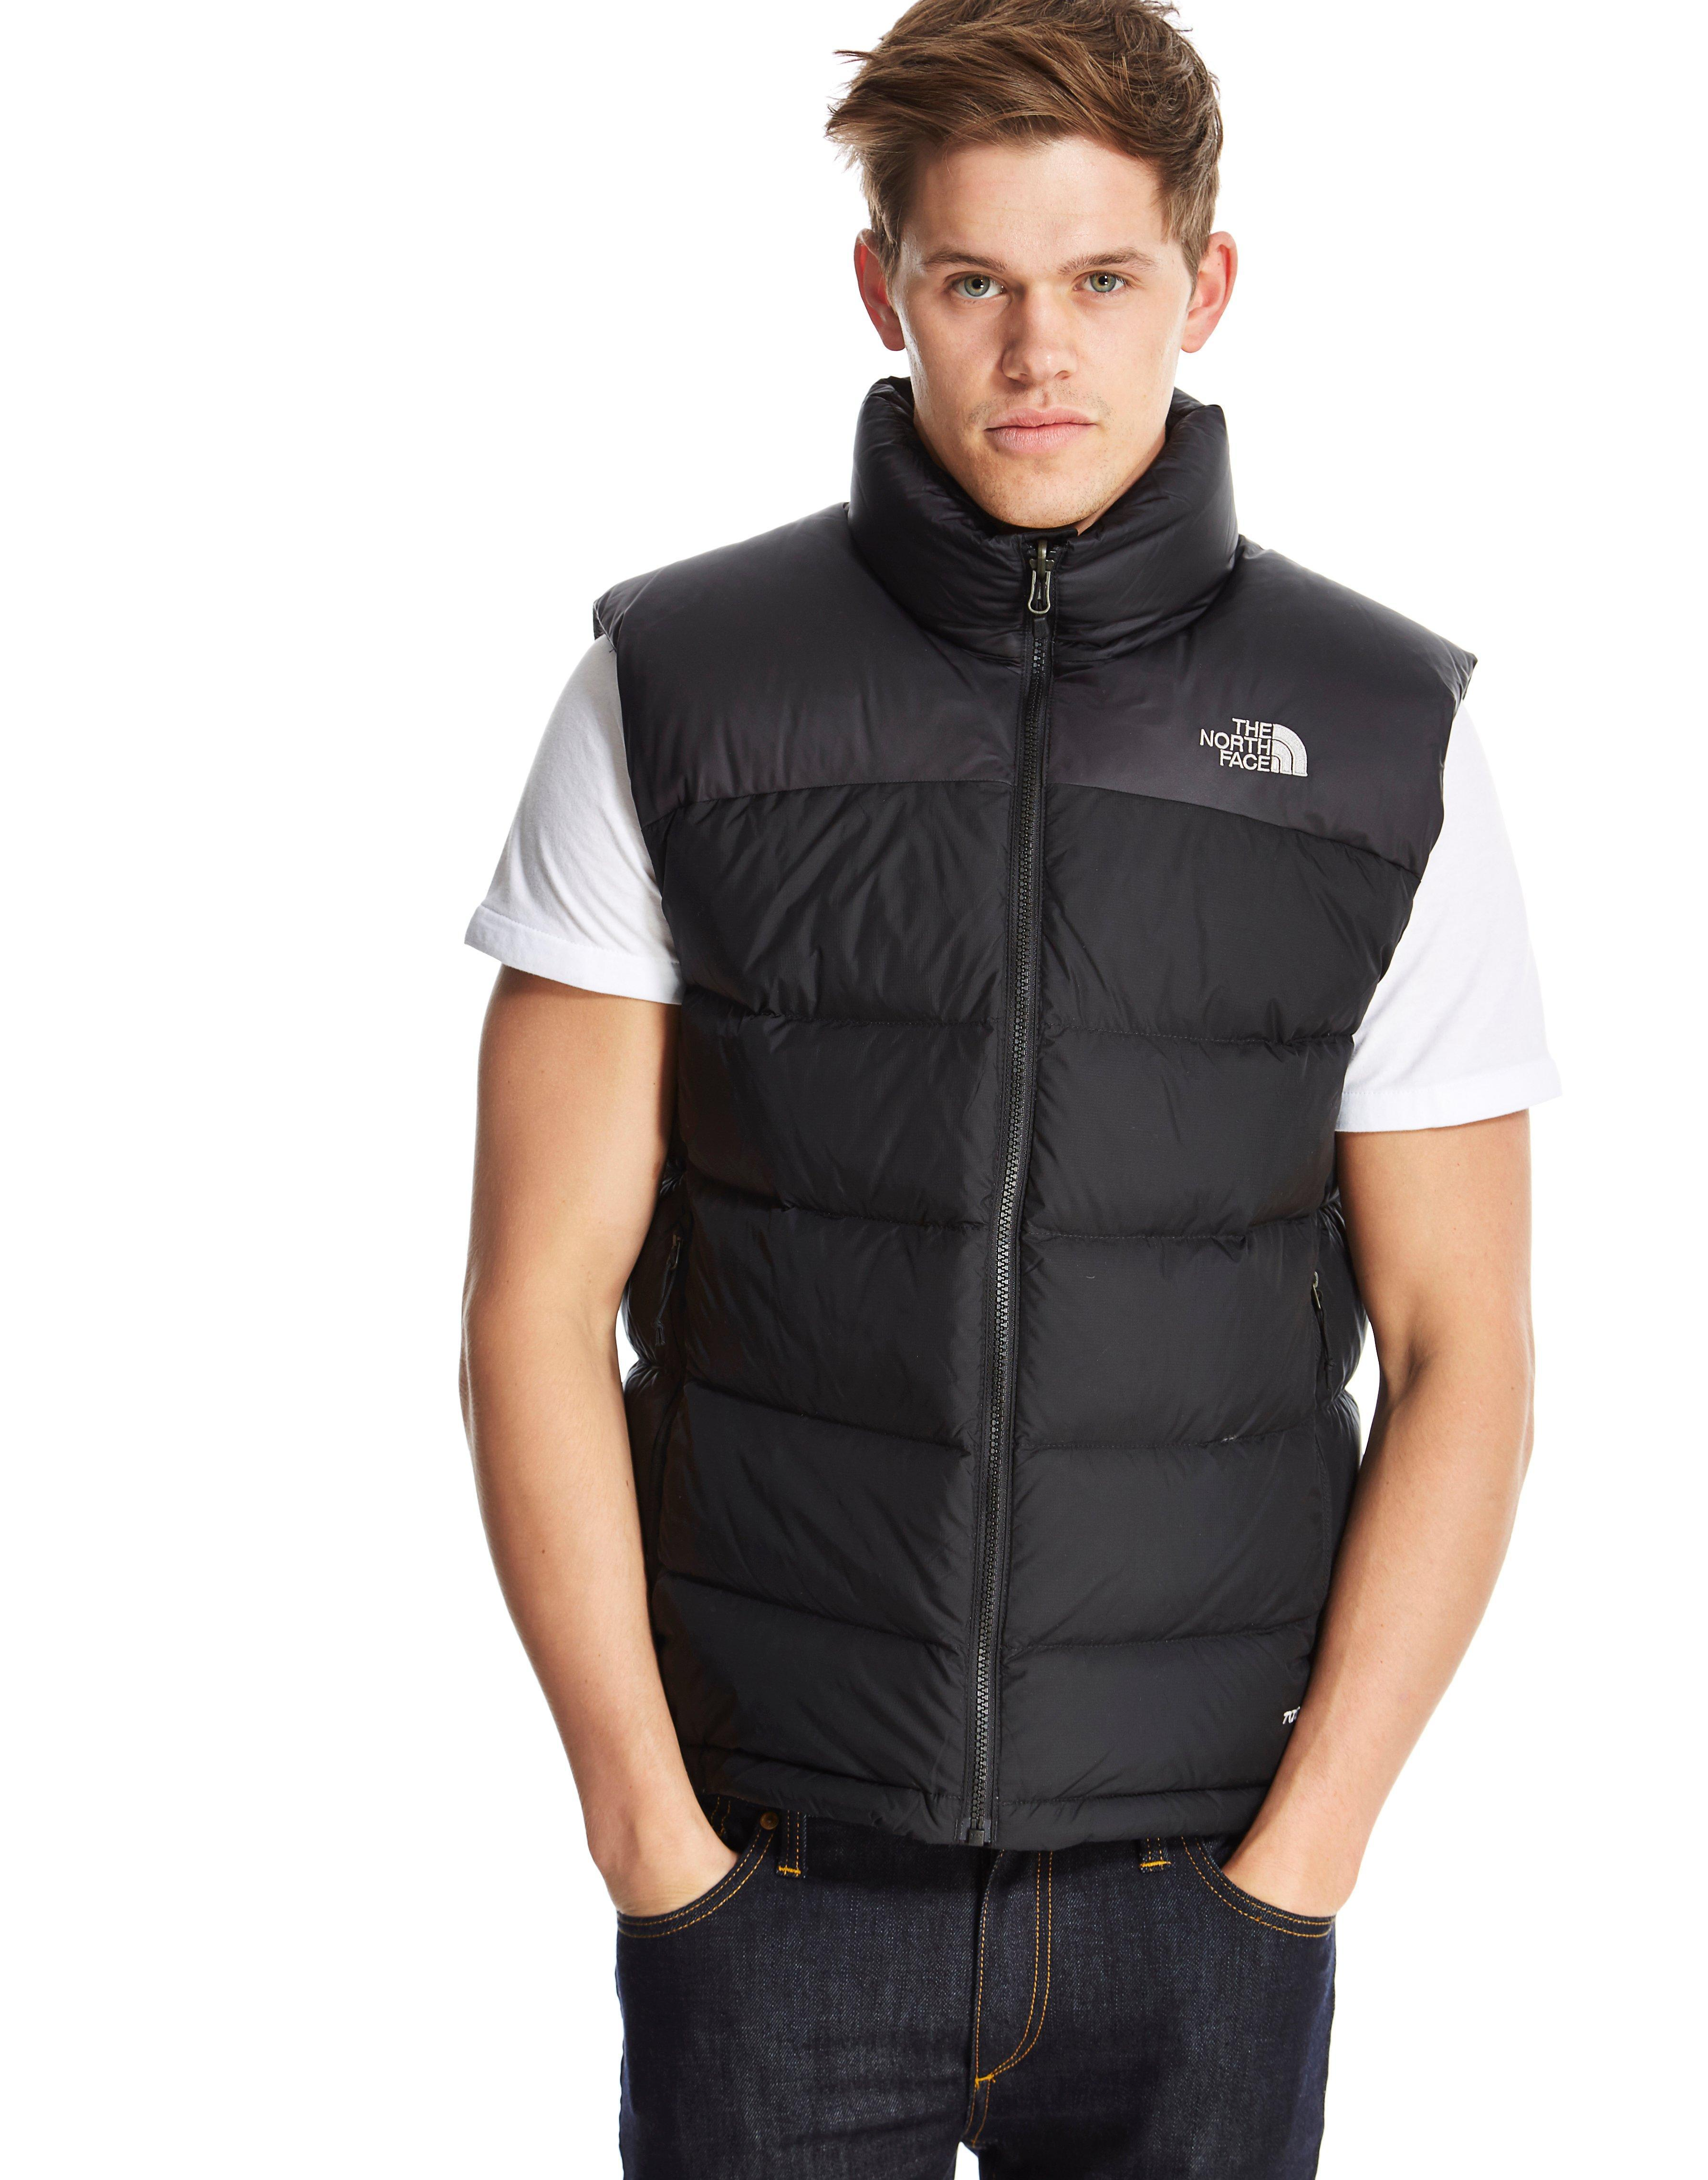 60809c515 The North Face Black Nuptse 2 Vest for men